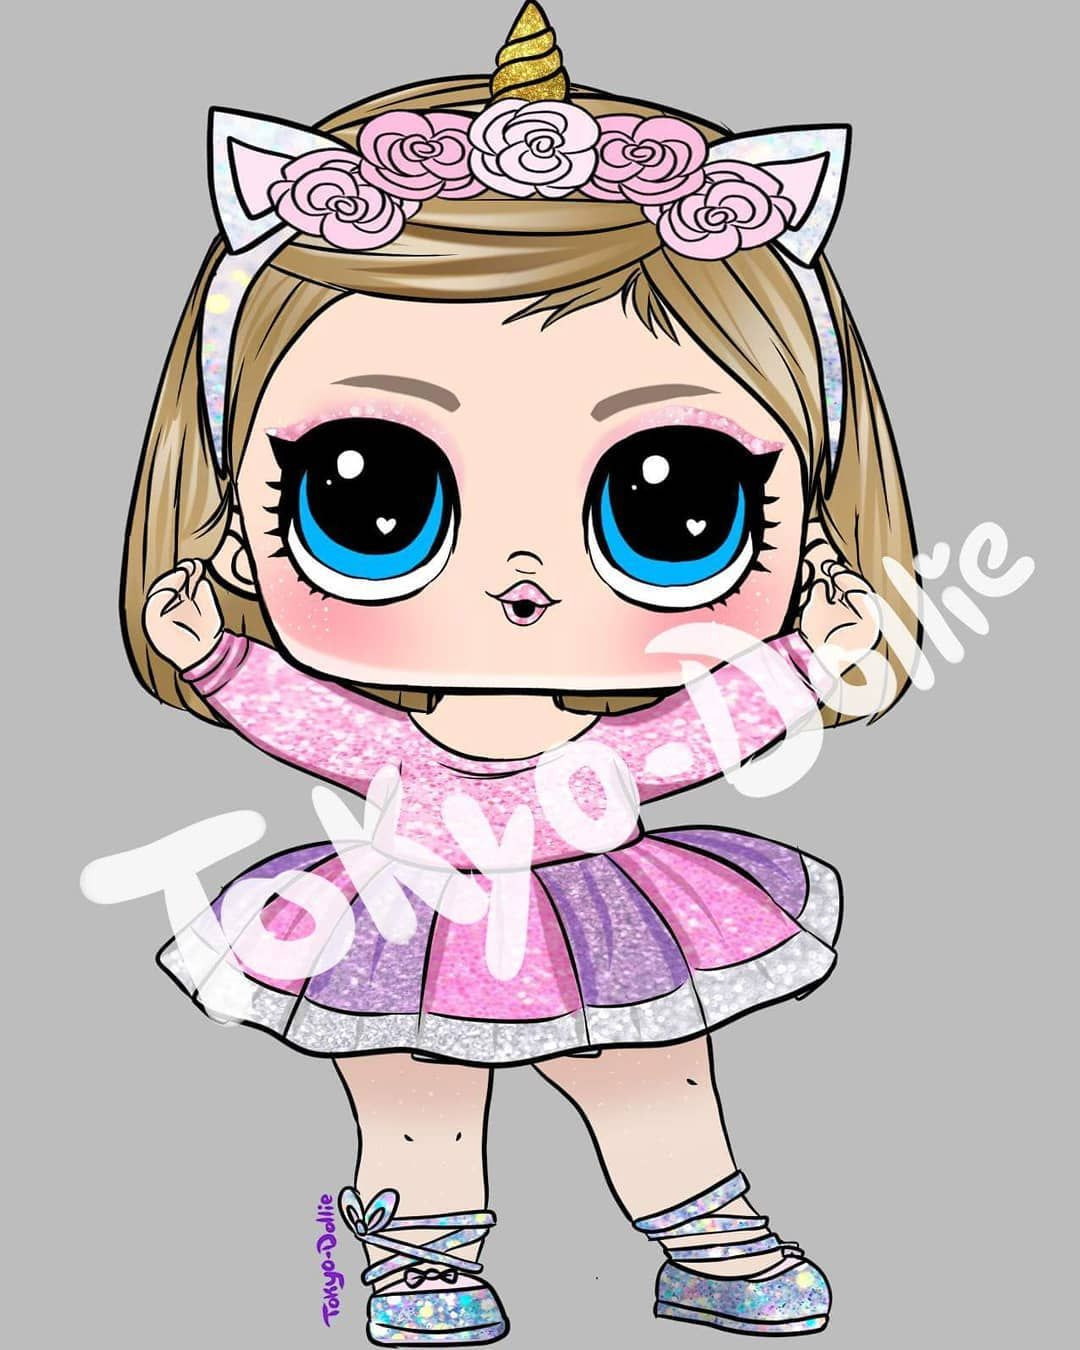 Lolsurprise Lolcustom Lolsurprisecustom Drawing Forfun Cute Illustration Artwork Tokyodollie Lolsurprise Lolsurprisefa Bonecas Desenhos Kawaii Lol